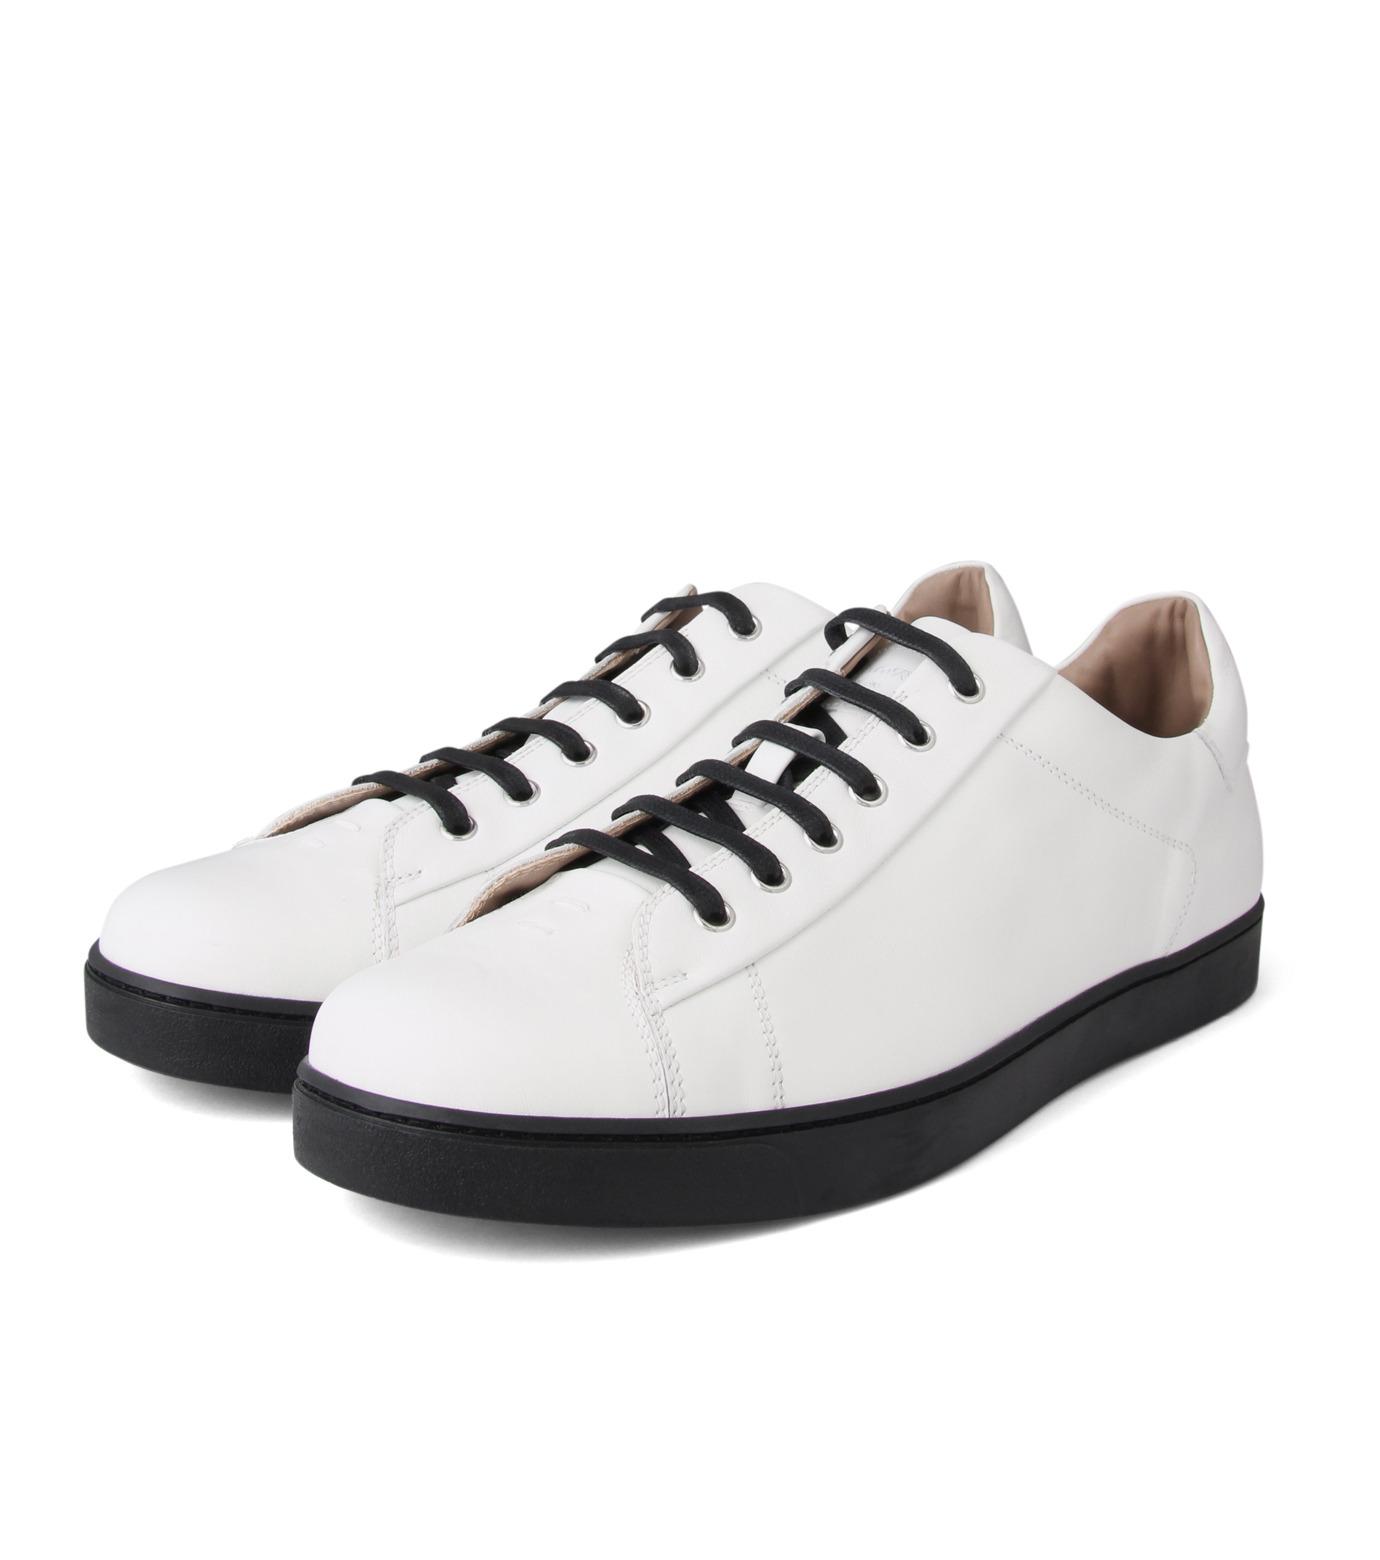 Gianvito Rossi(ジャンヴィト ロッシ)のLowcut Sneaker-WHITE(スニーカー/sneaker)-S26340-4 拡大詳細画像3